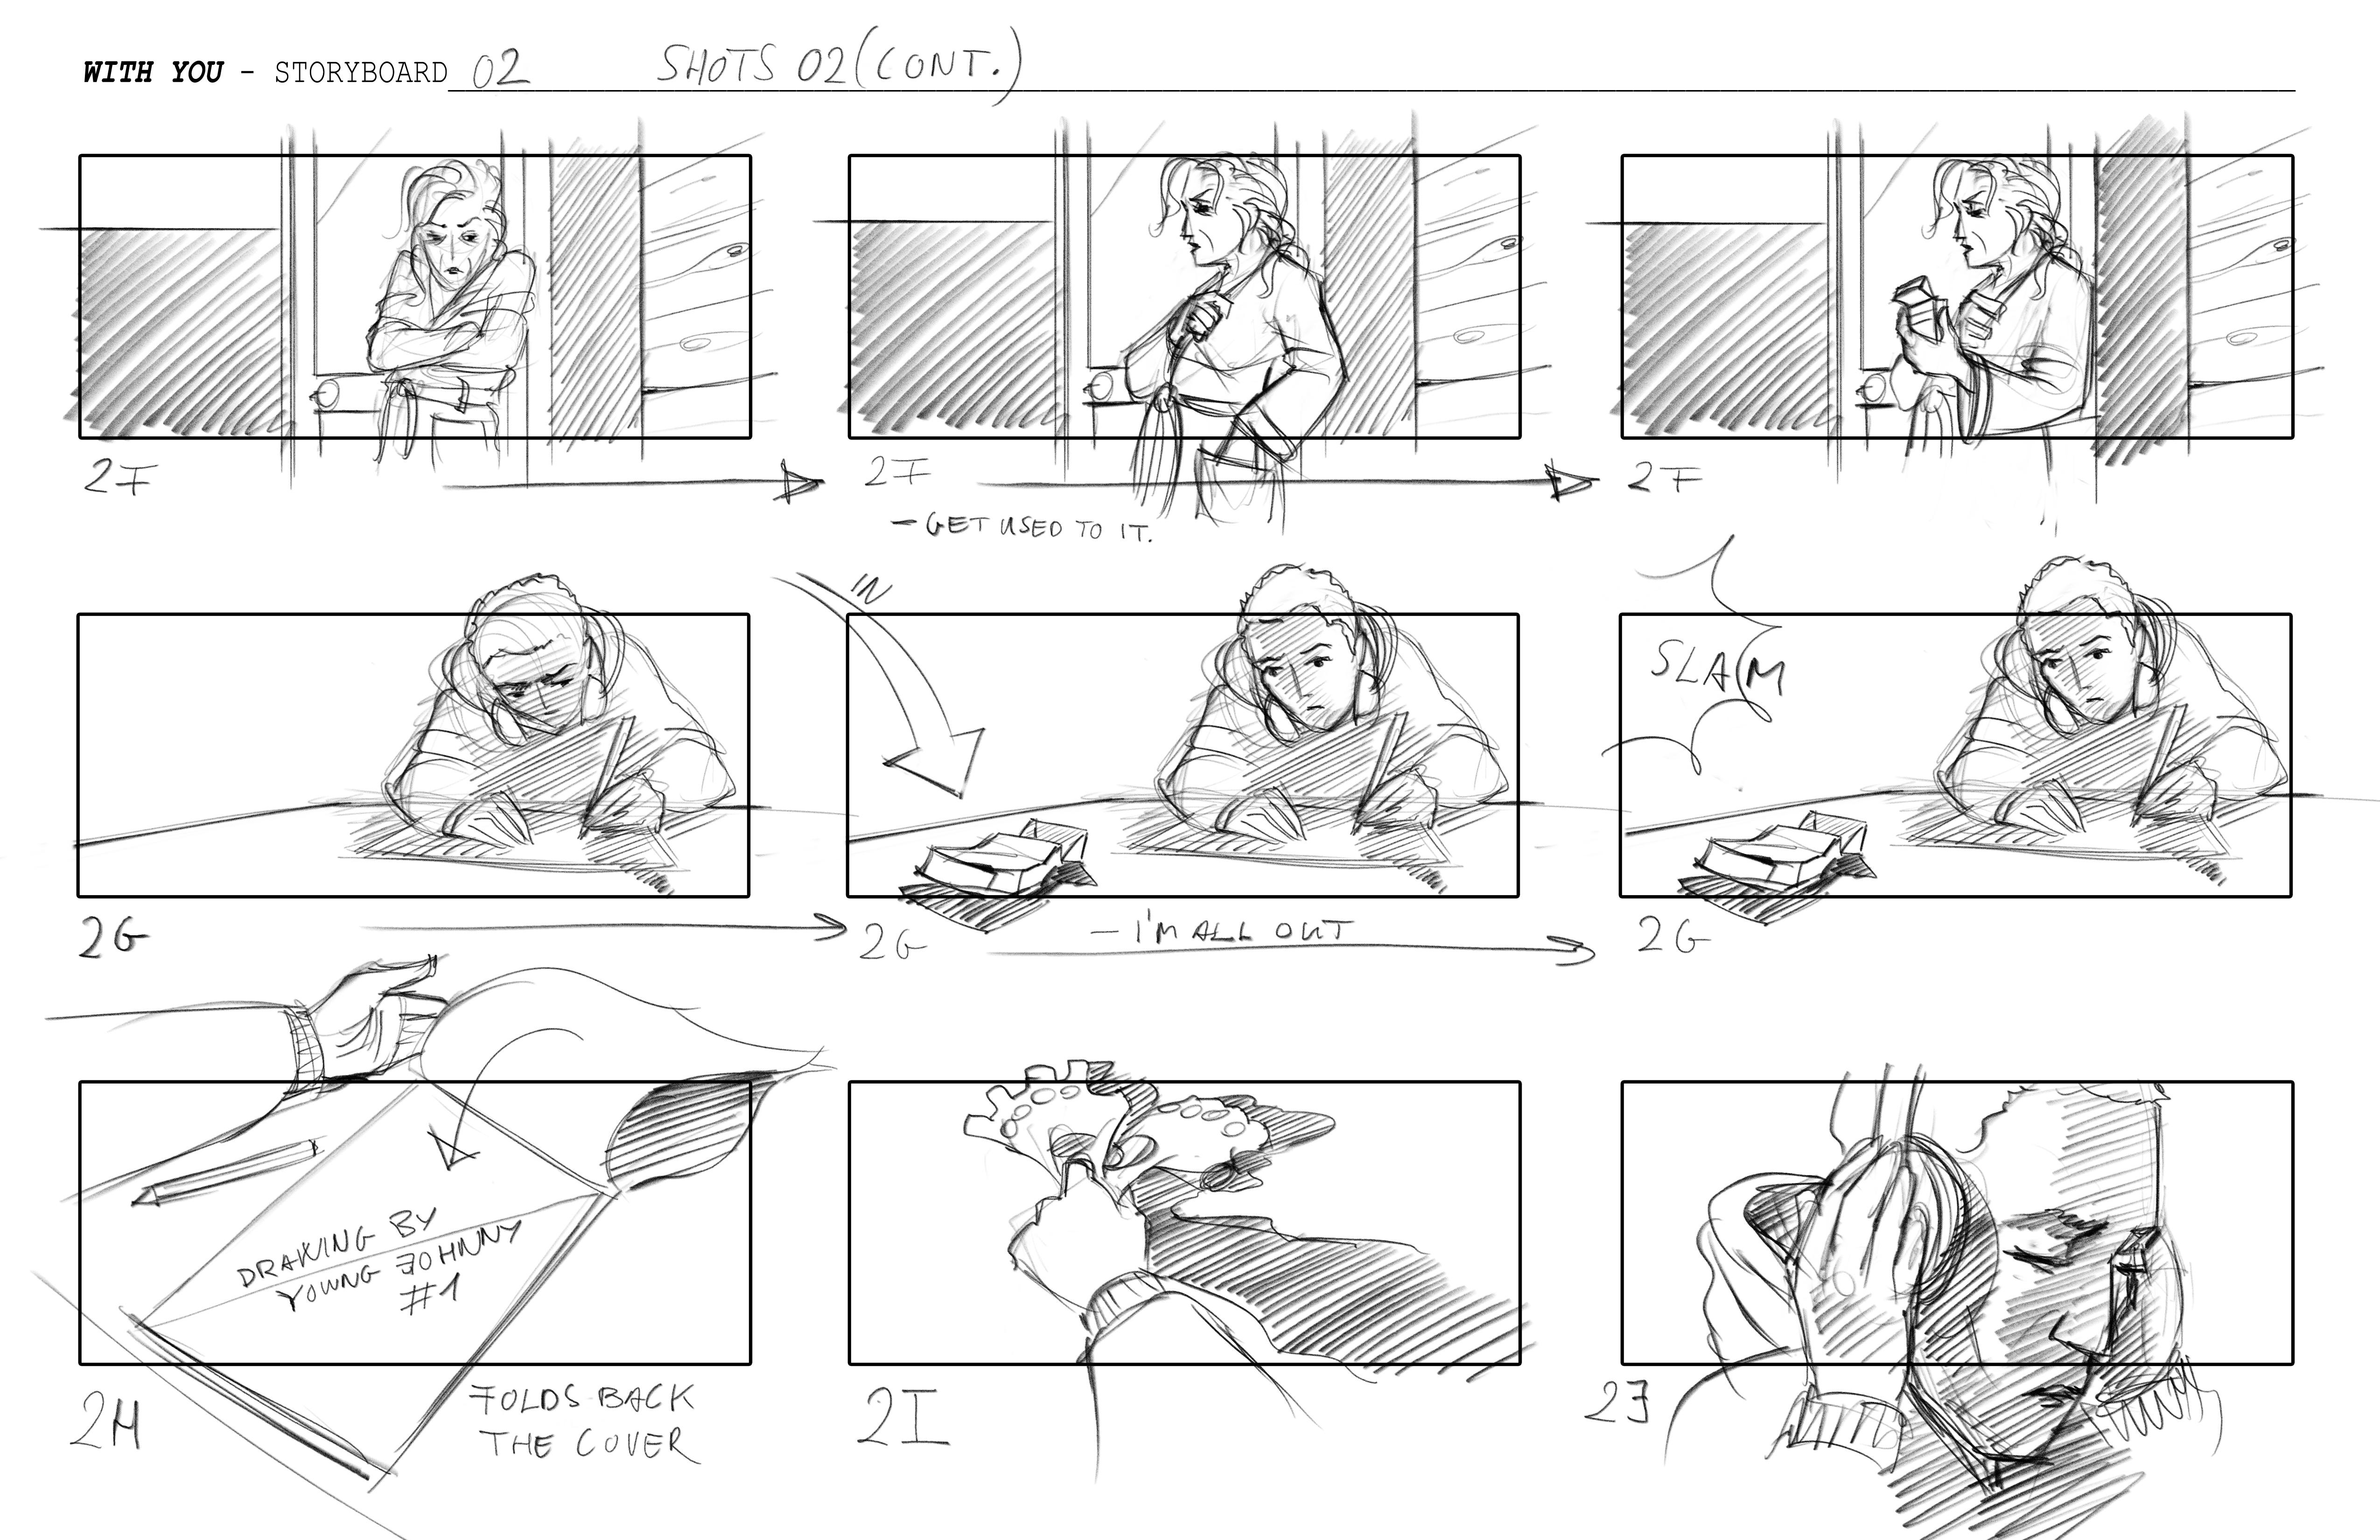 storyboard sheet 02